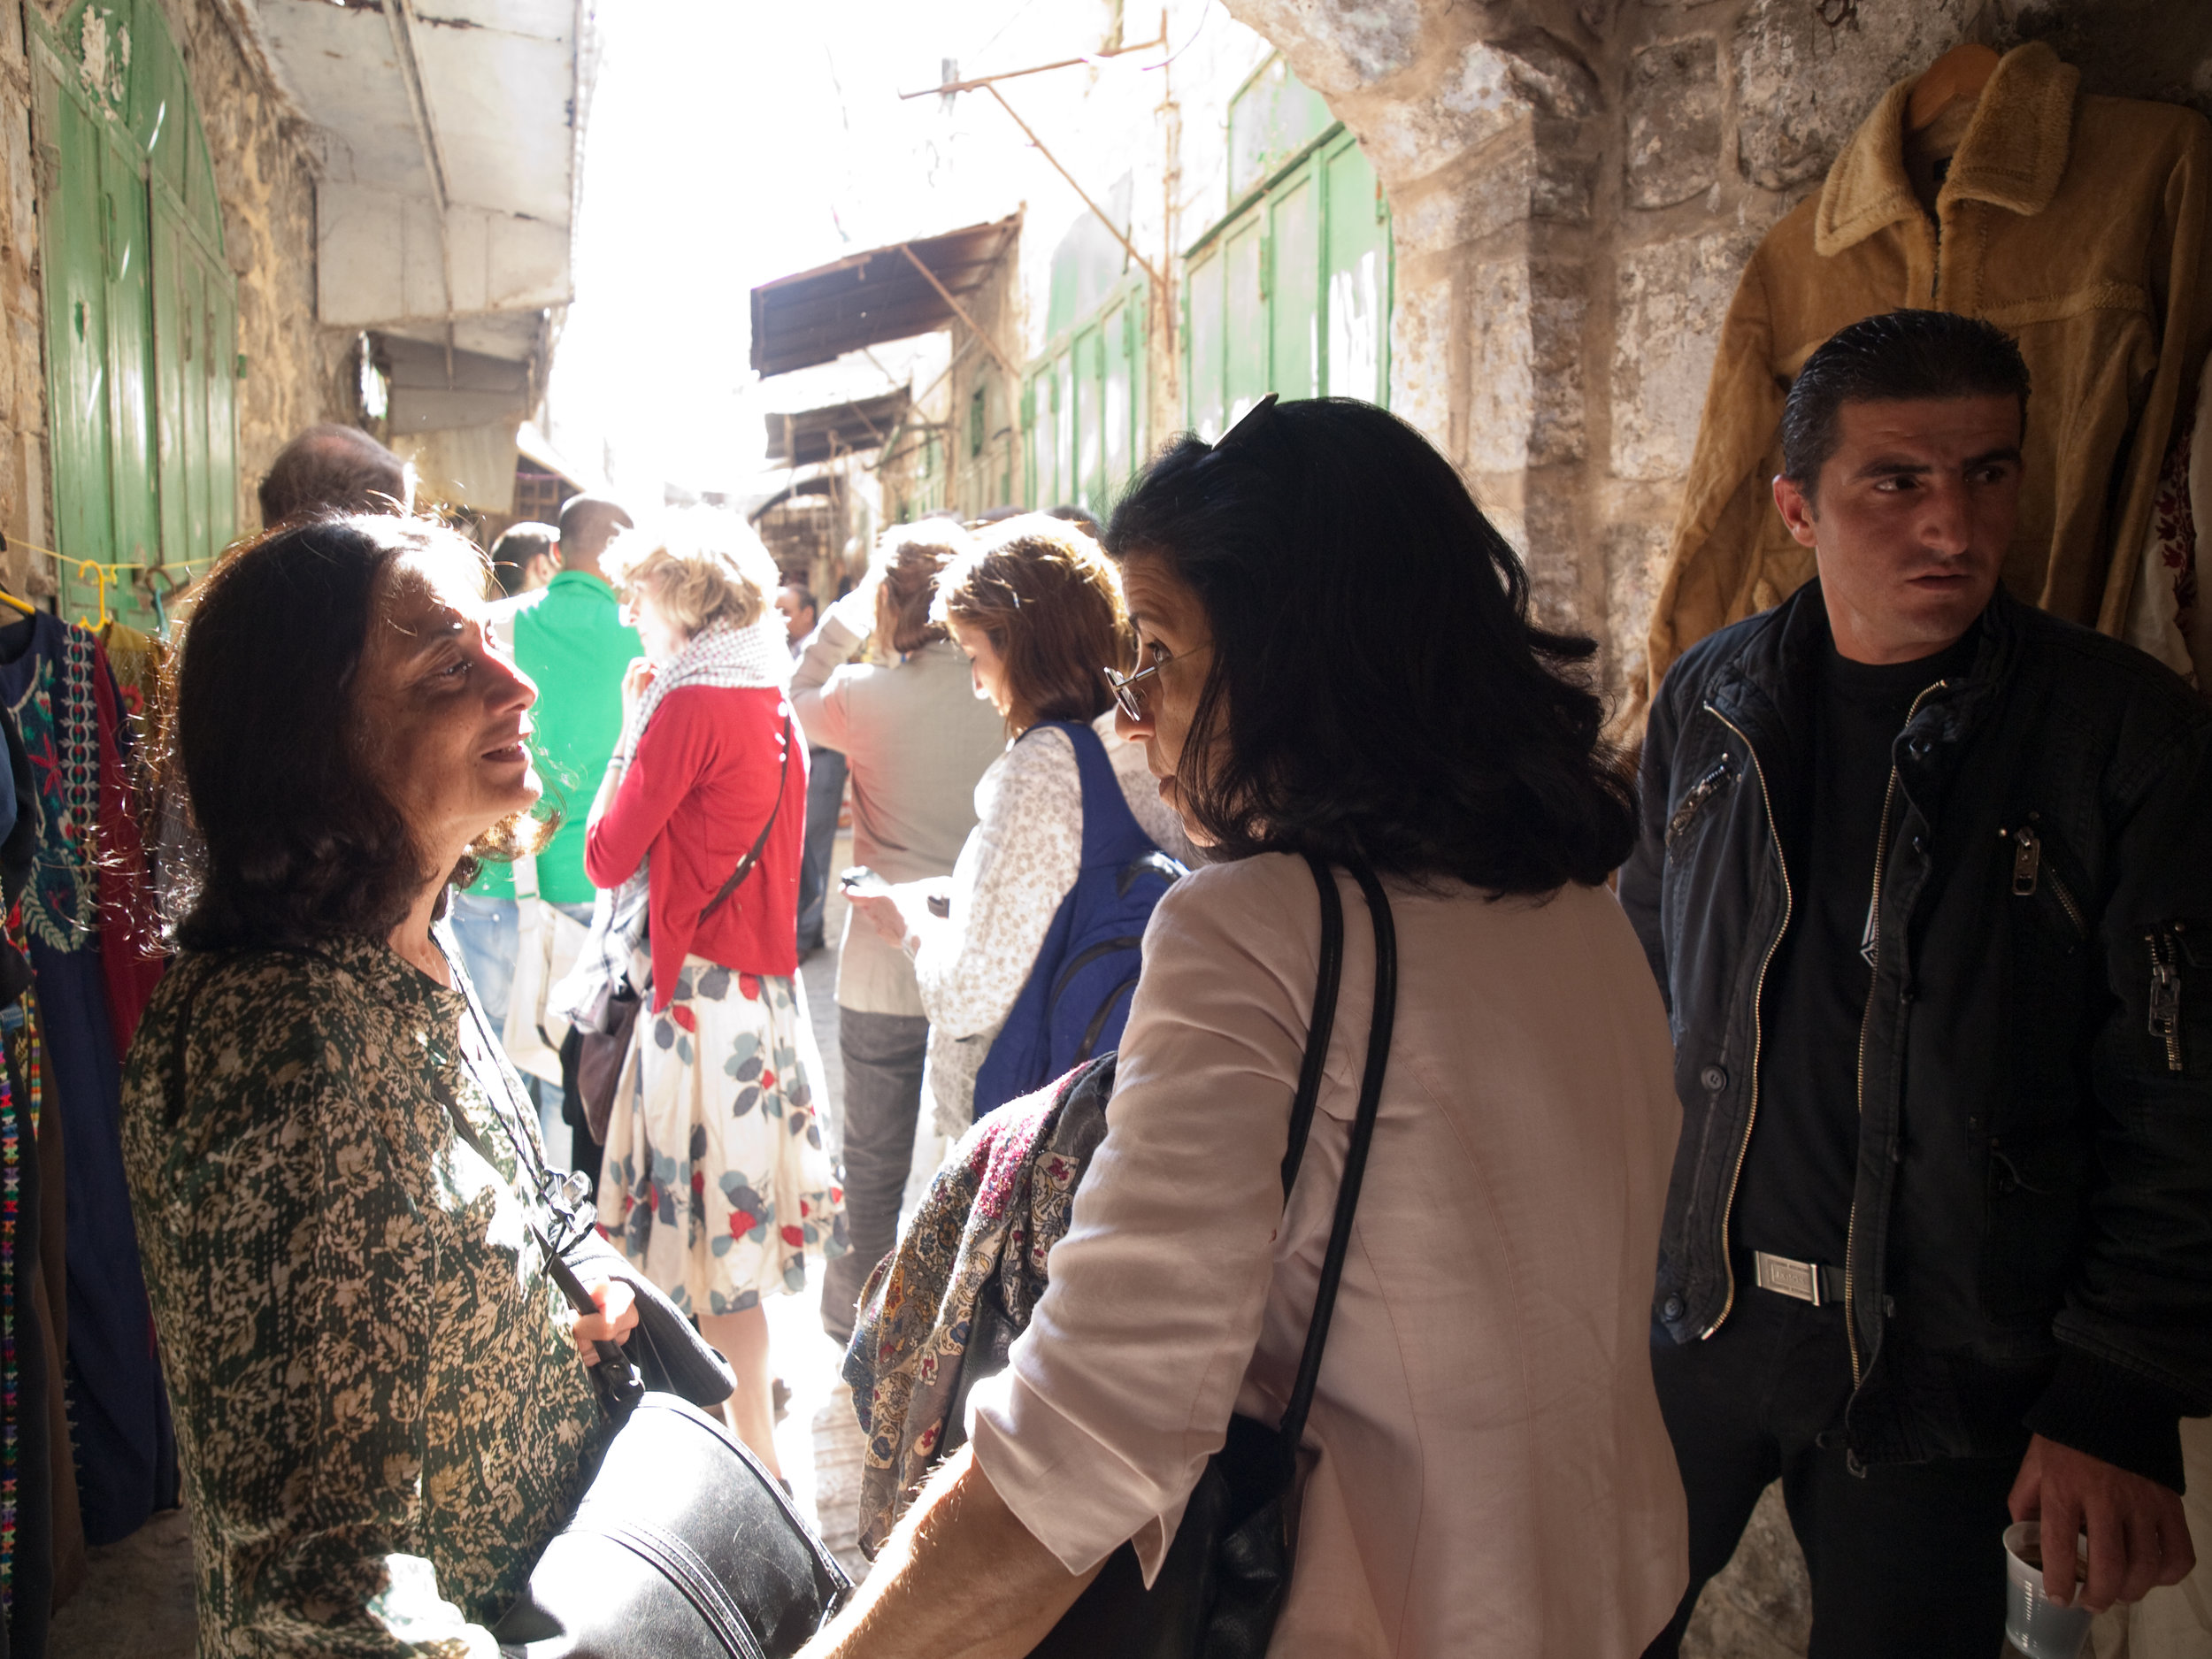 Ritu Menon and Ahdaf Soueif in Hebron during PalFest 2010, photo by Raouf Hajj Yehia